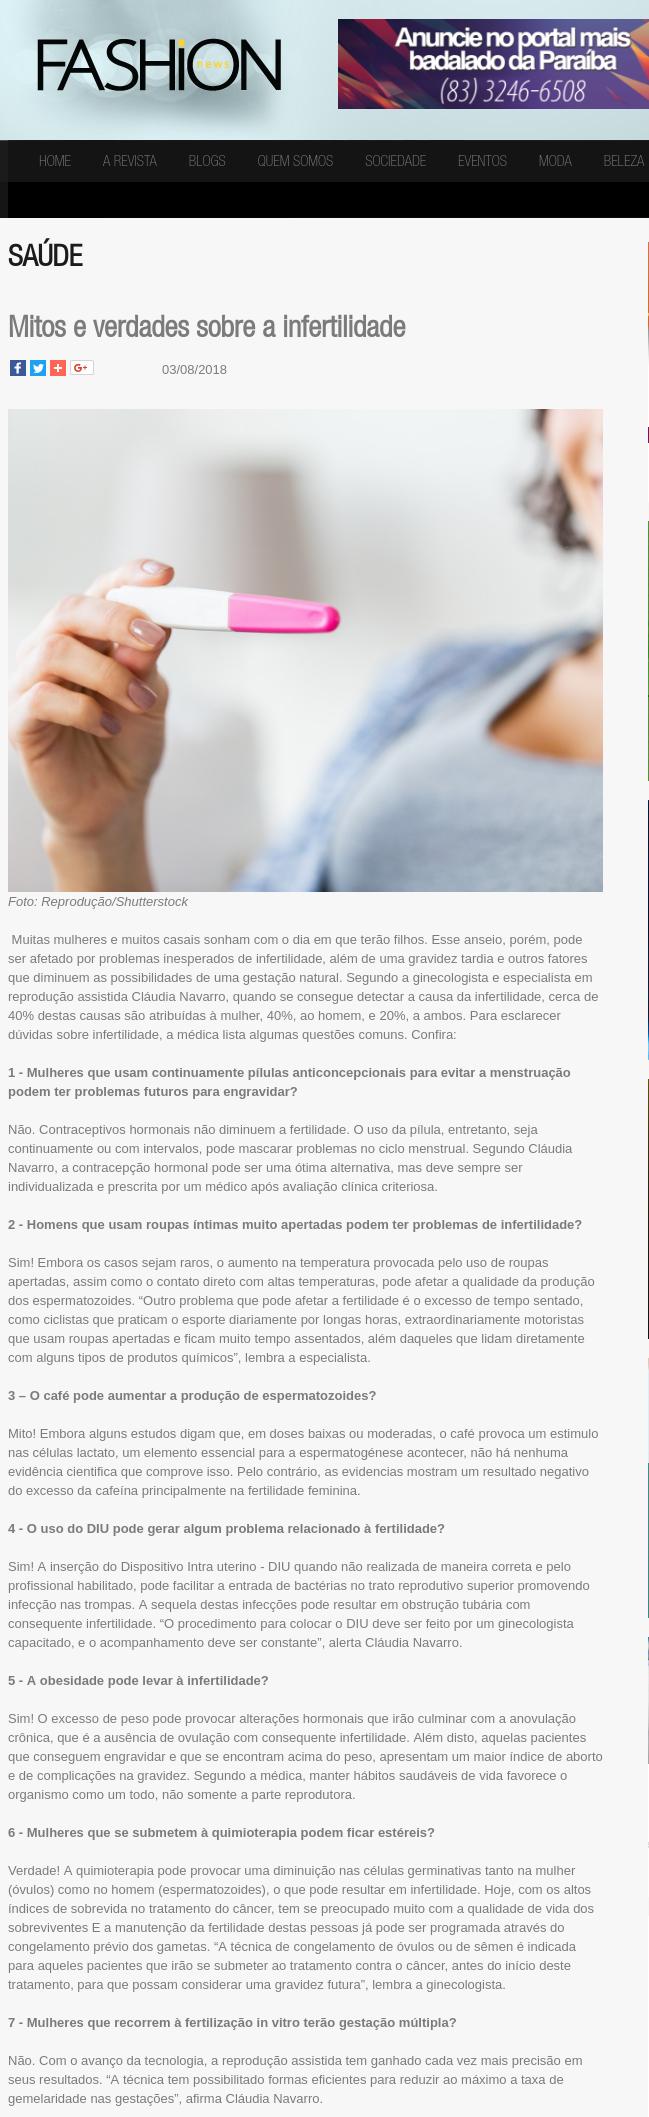 Revista Fashion News (site) – Mitos e verdades sobre a infertilidade